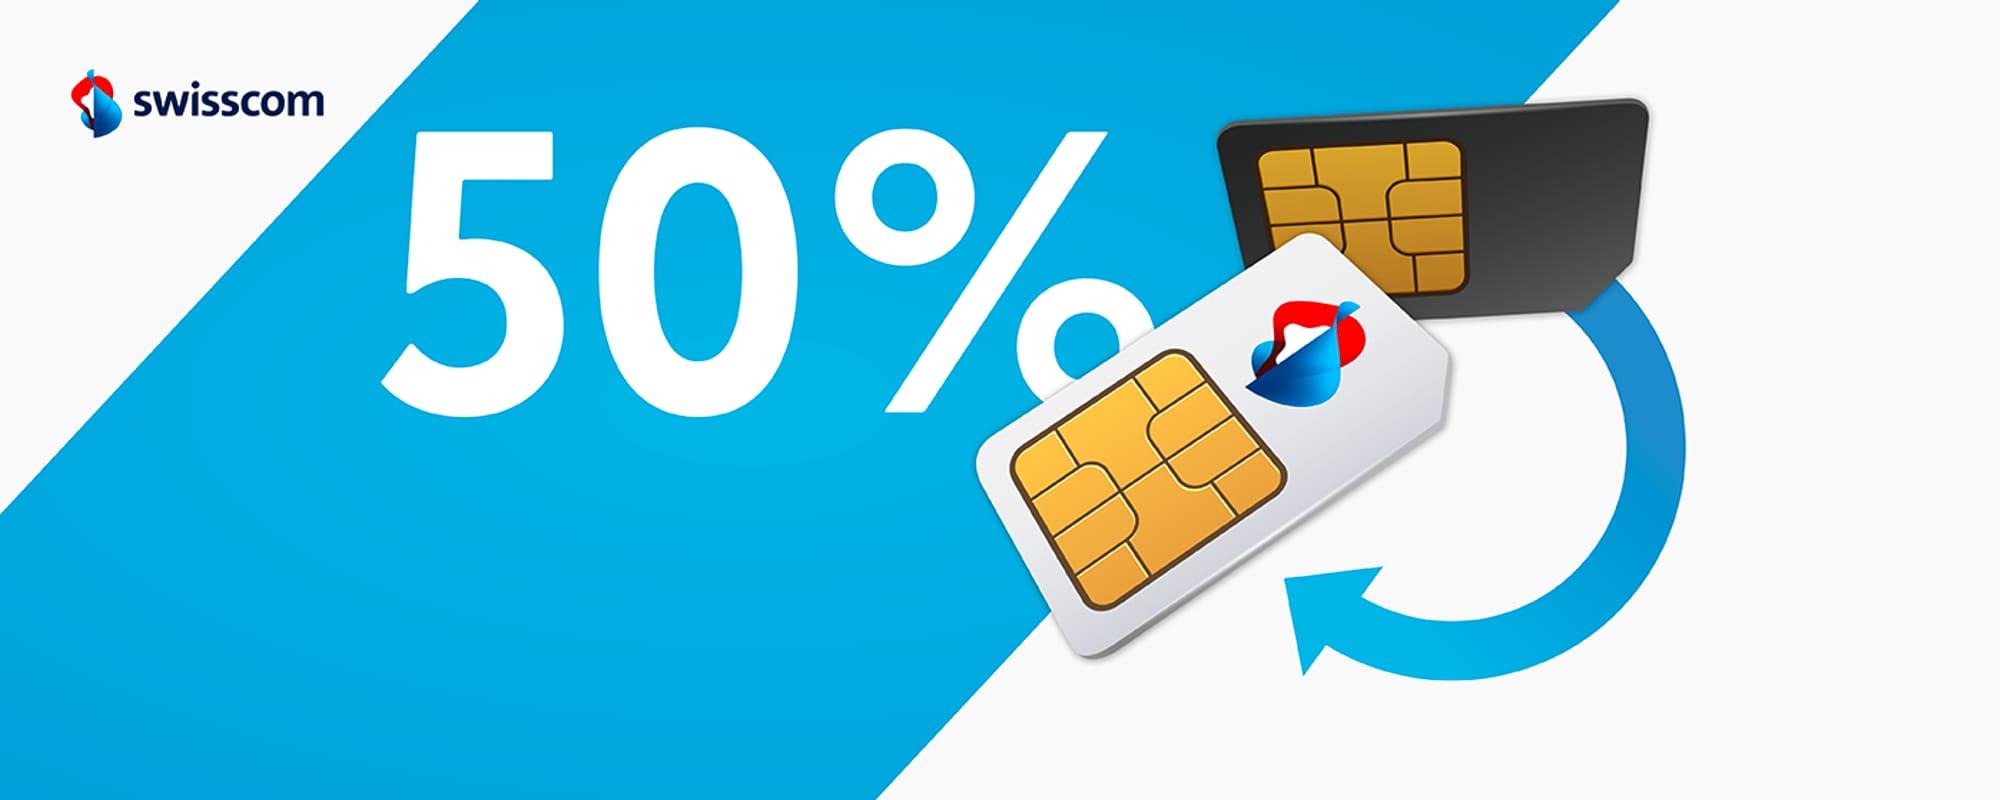 Swisscom Prepaid to Postpaid